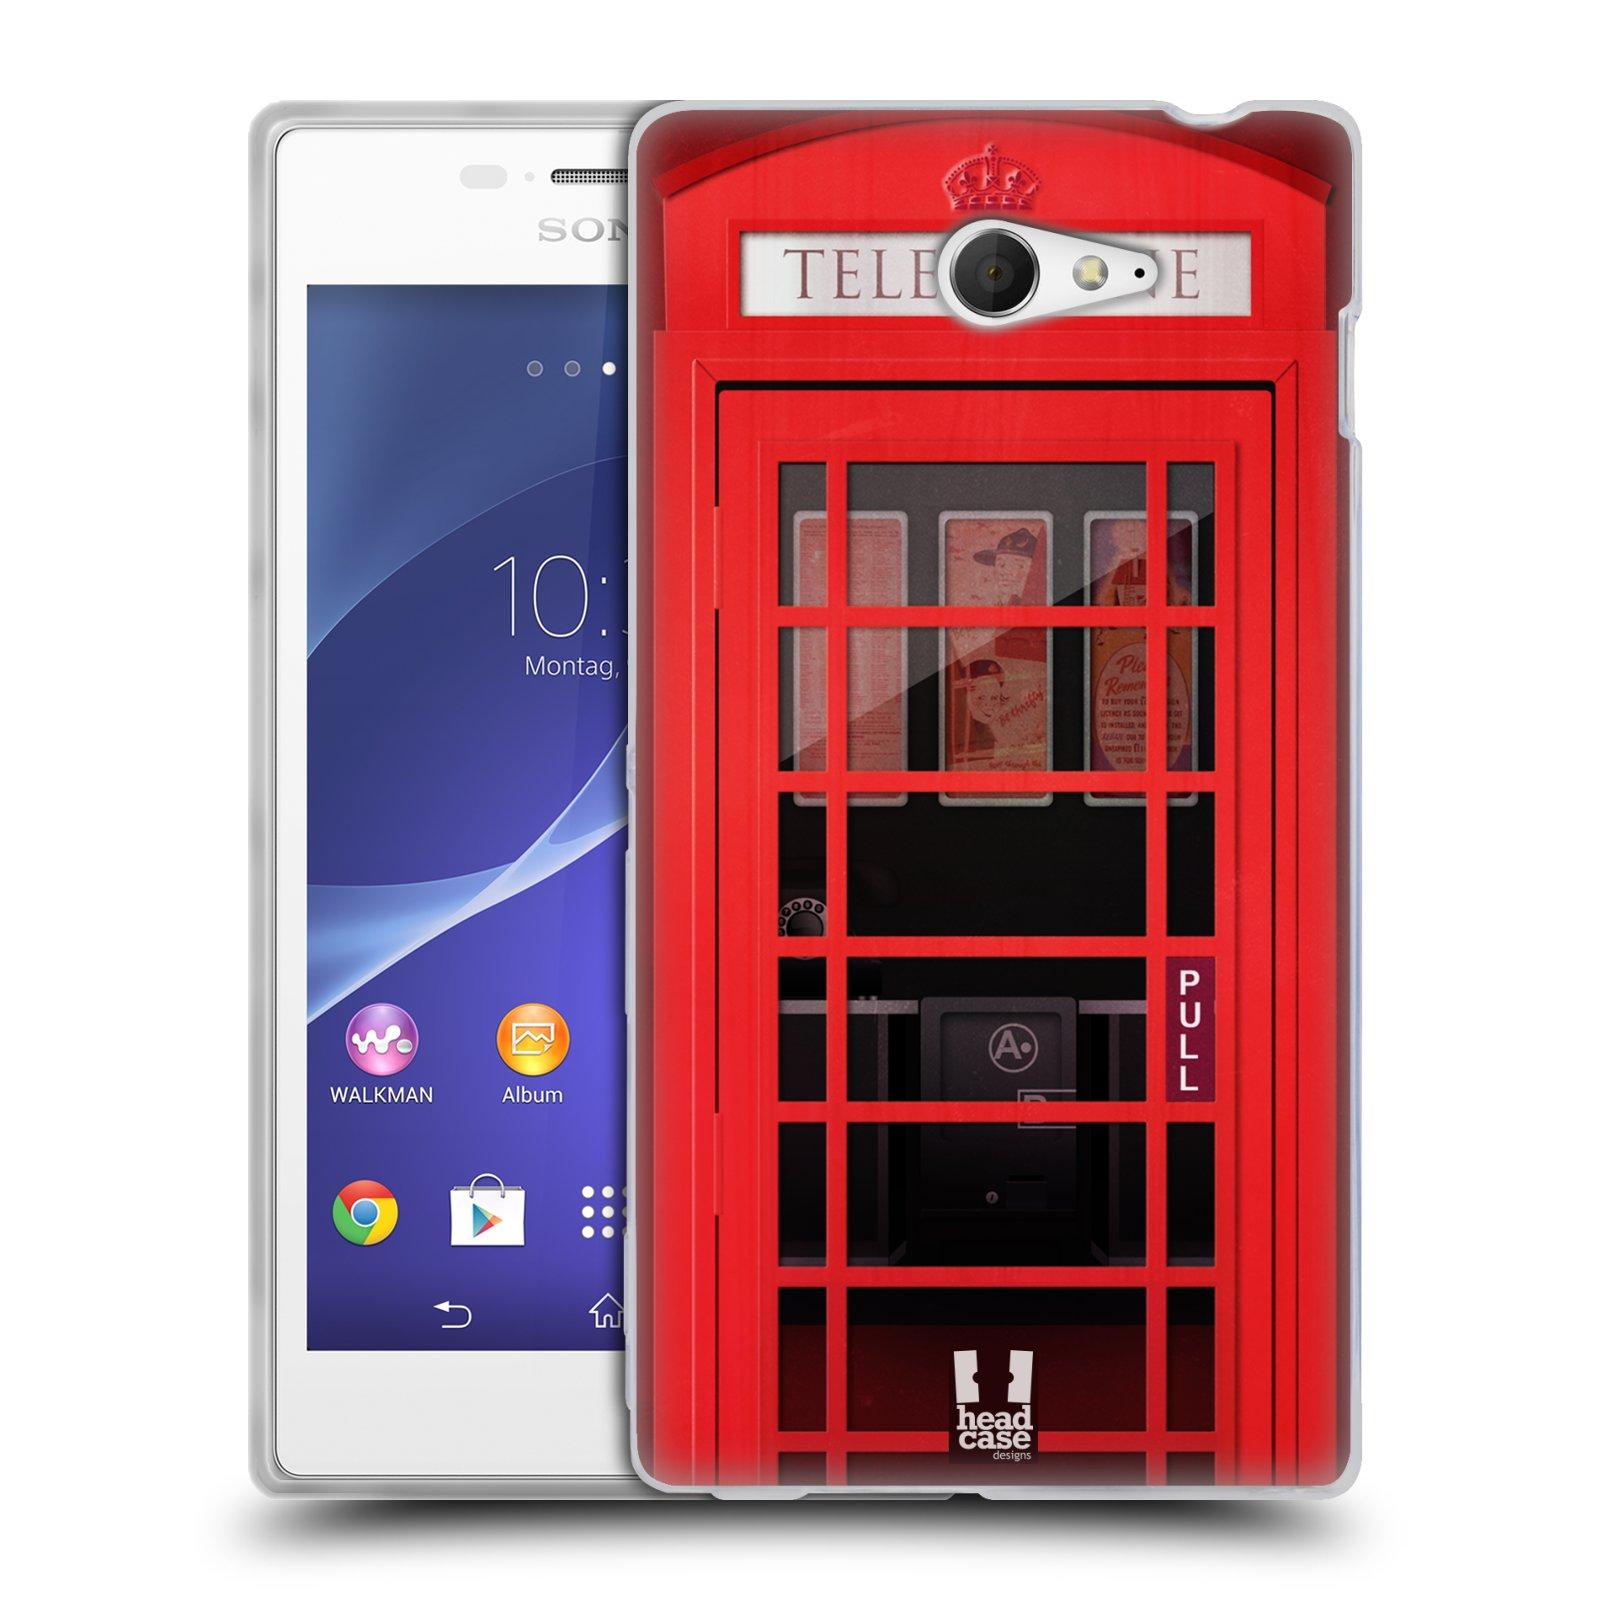 Silikonové pouzdro na mobil Sony Xperia M2 D2303 HEAD CASE TELEFONNÍ BUDKA